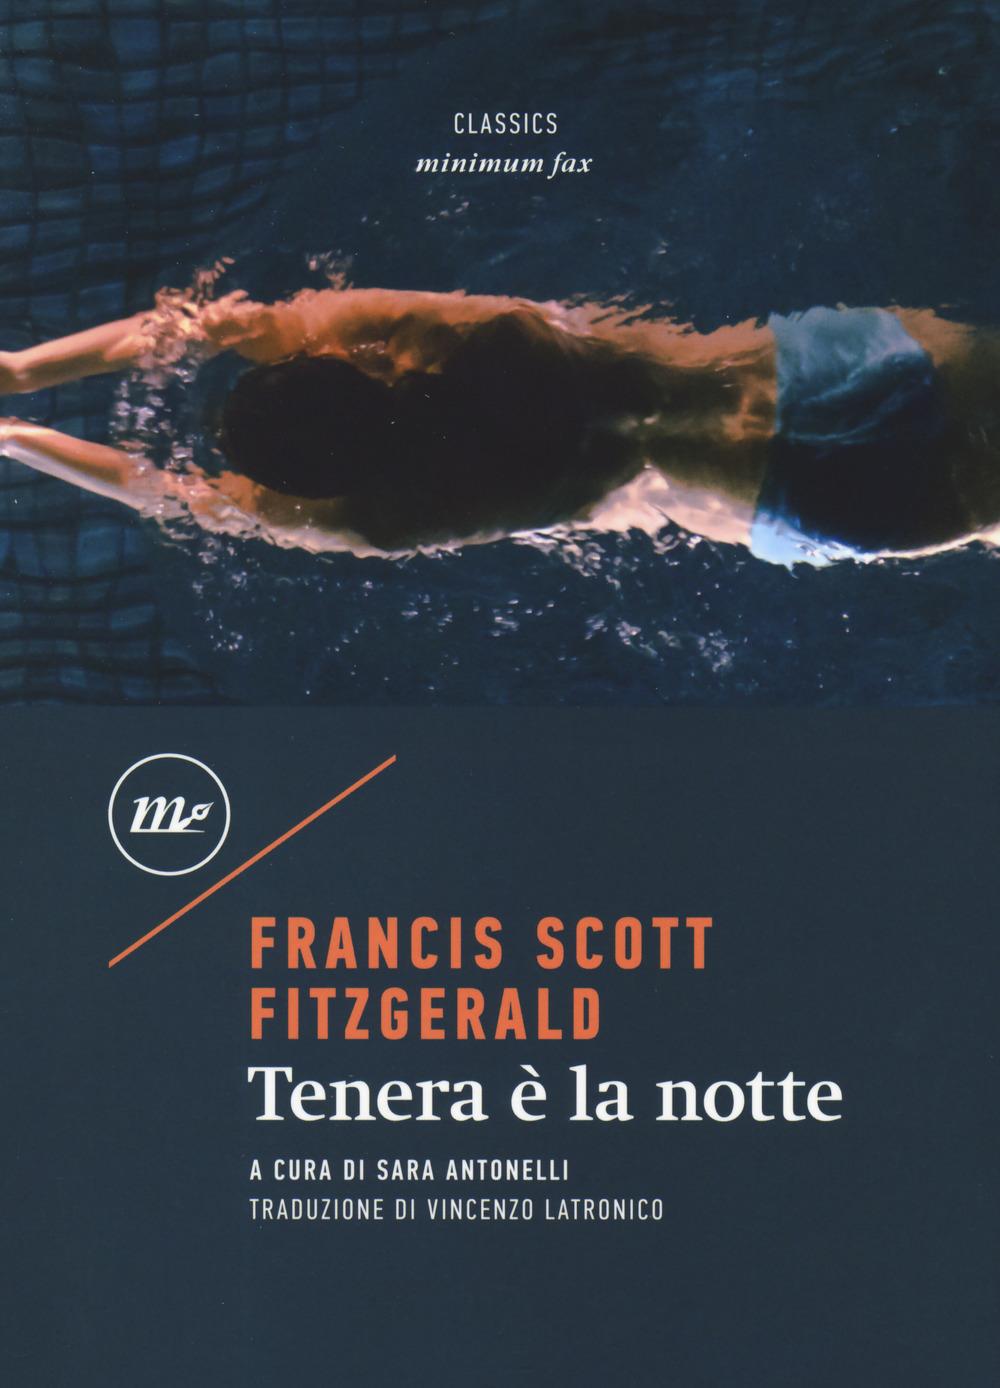 Tenera è la notte - Fitzgerald Francis Scott; Antonelli S. (cur.) - 9788833891163